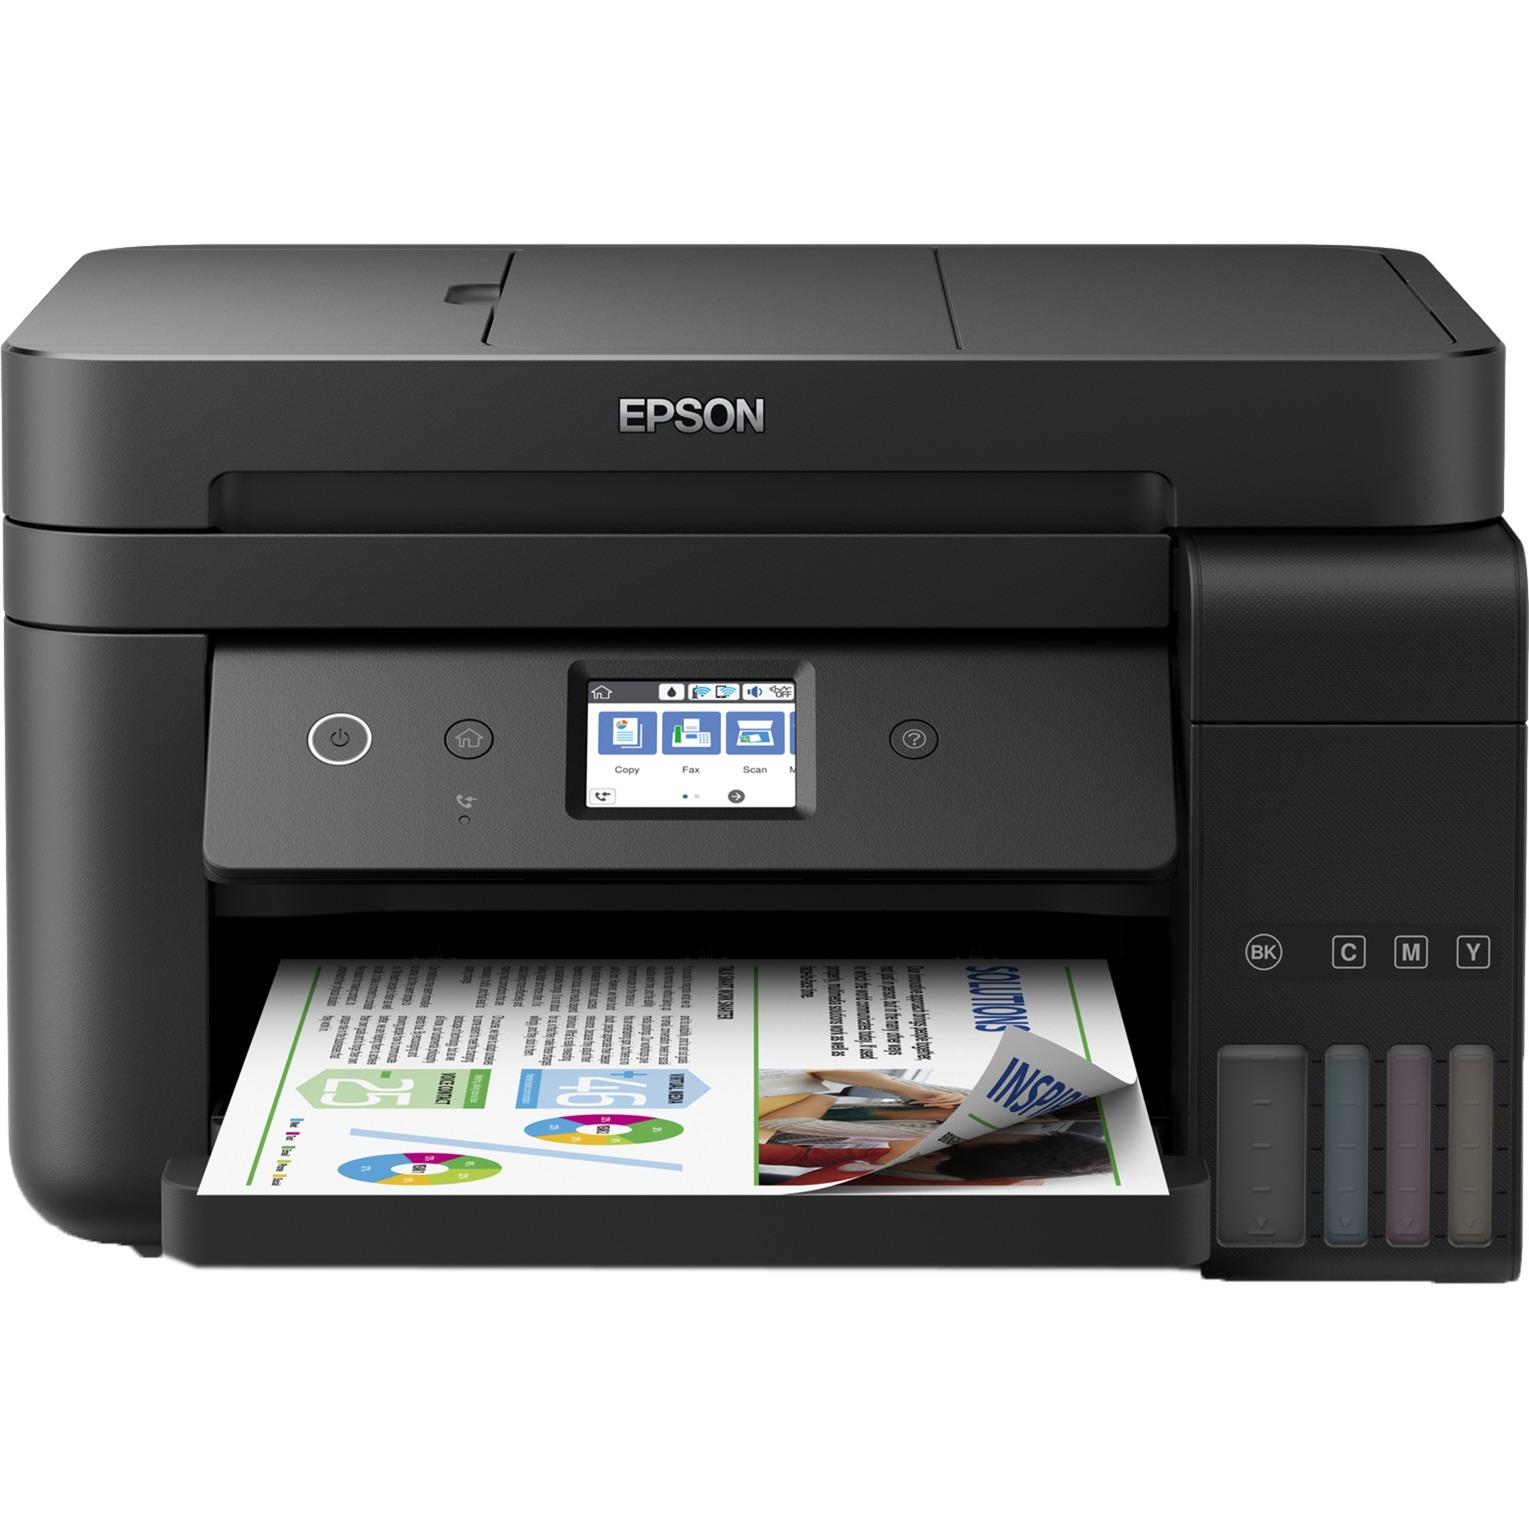 Epson EcoTank ET-4750, Multifunktionsdrucker schwarz, USB, WLAN, LAN ...